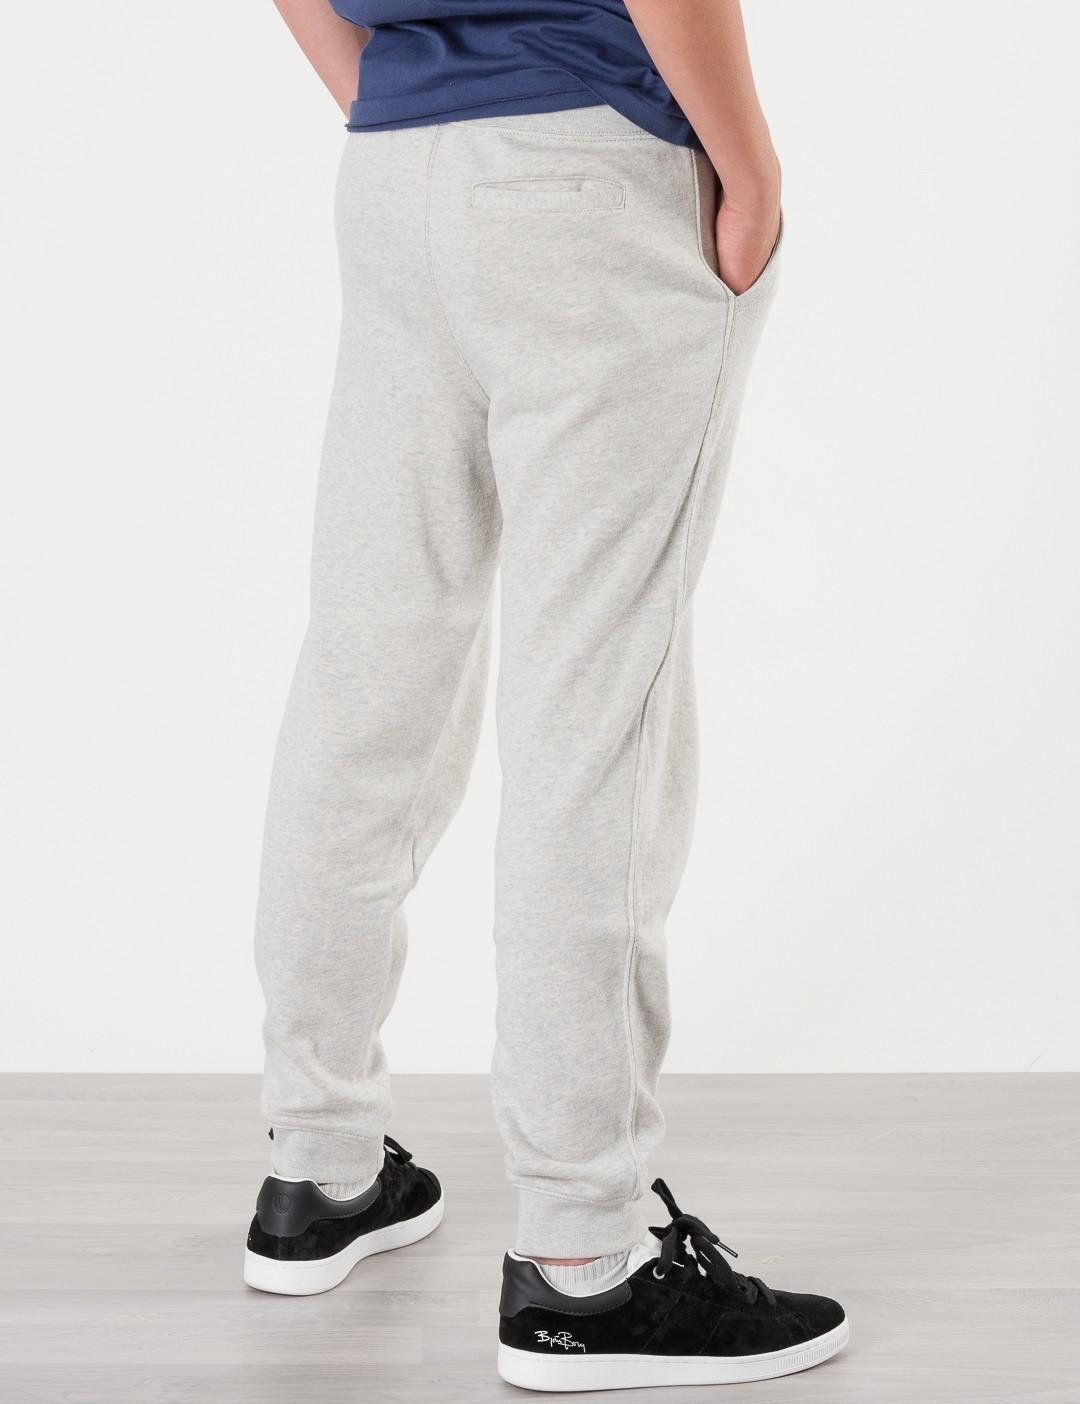 ea10db7e649d02 coupon for ralph lauren pants khaki grå 3e5d0 f2bf9